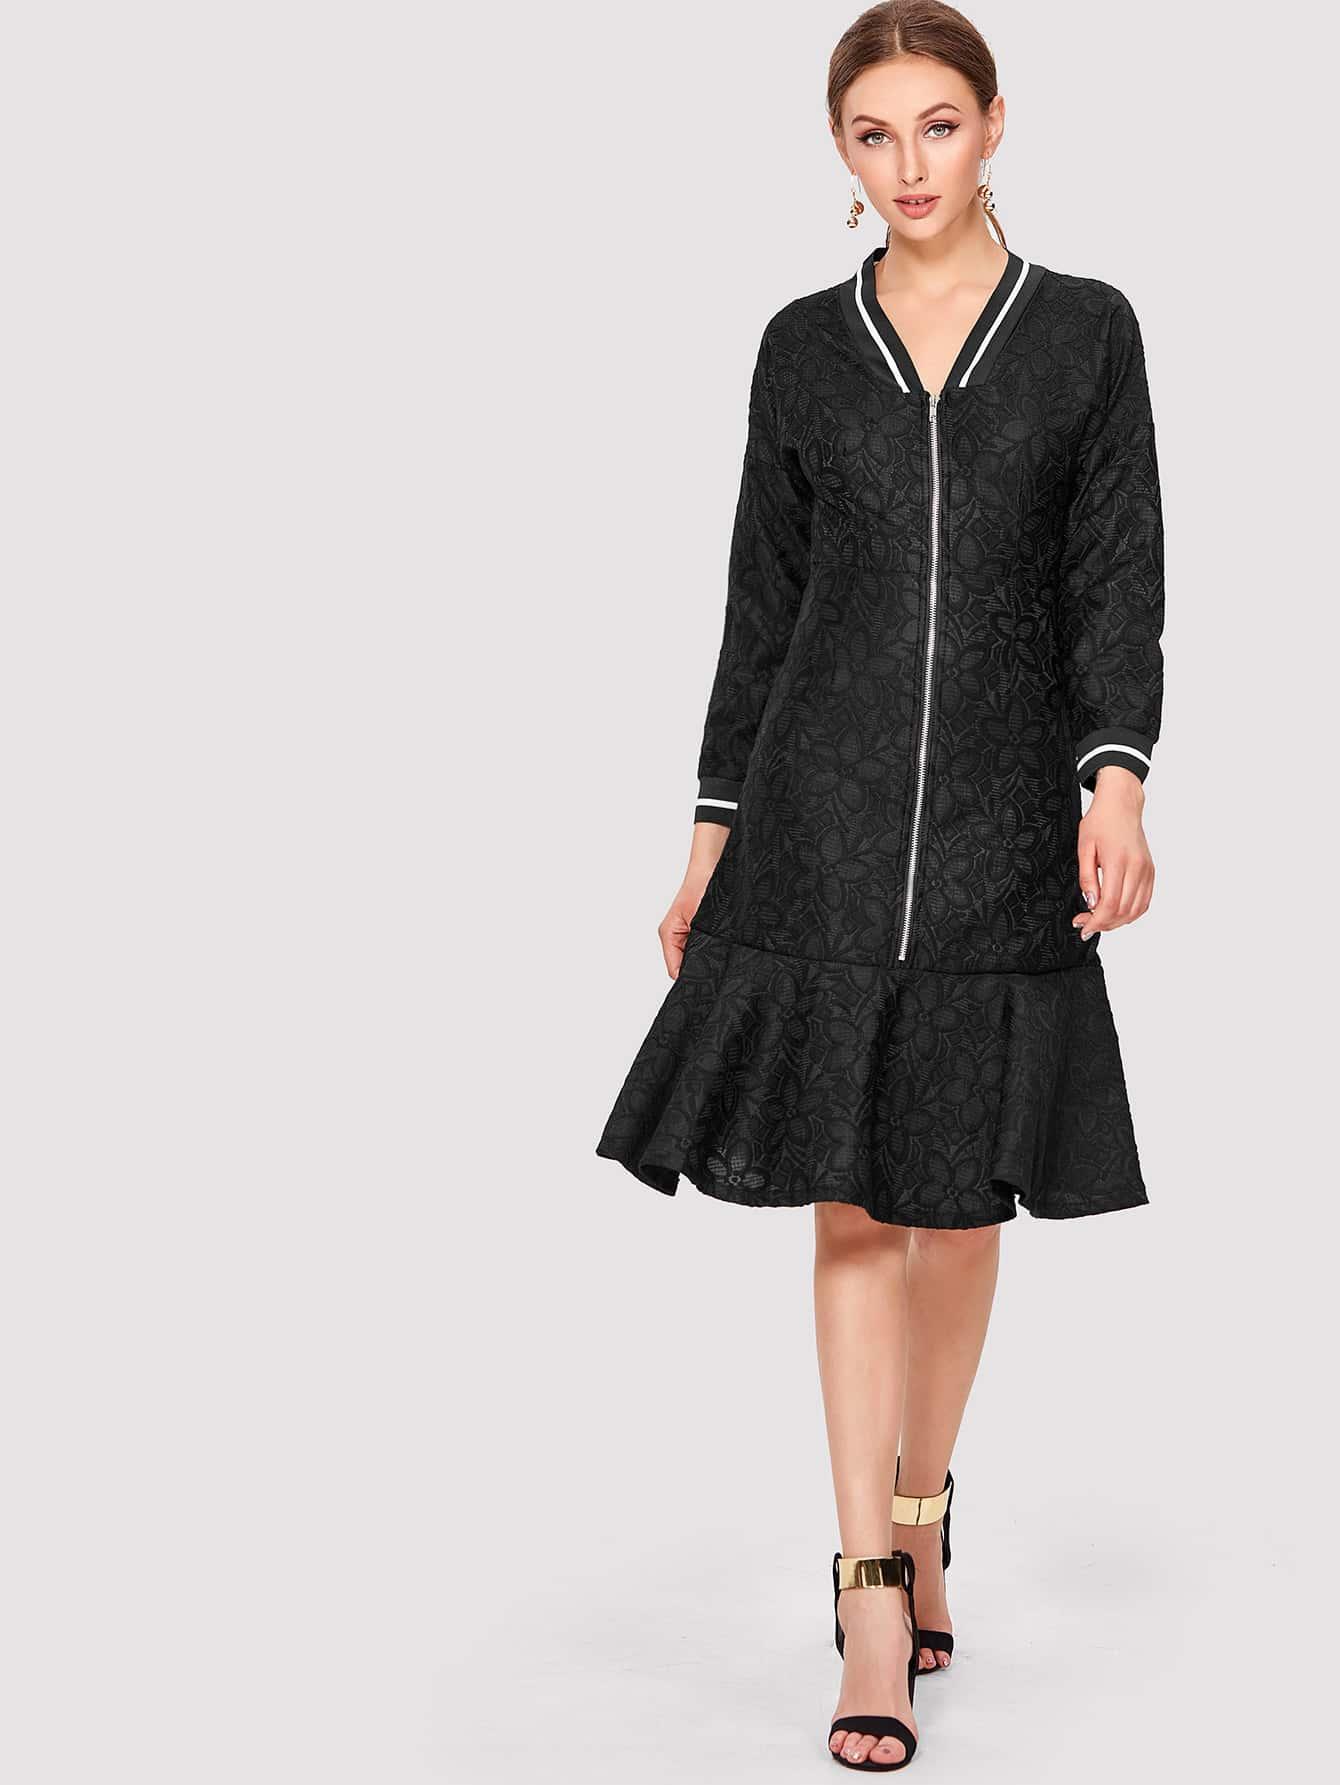 Zip Front Ruffle Hem Dress zip front tank dress